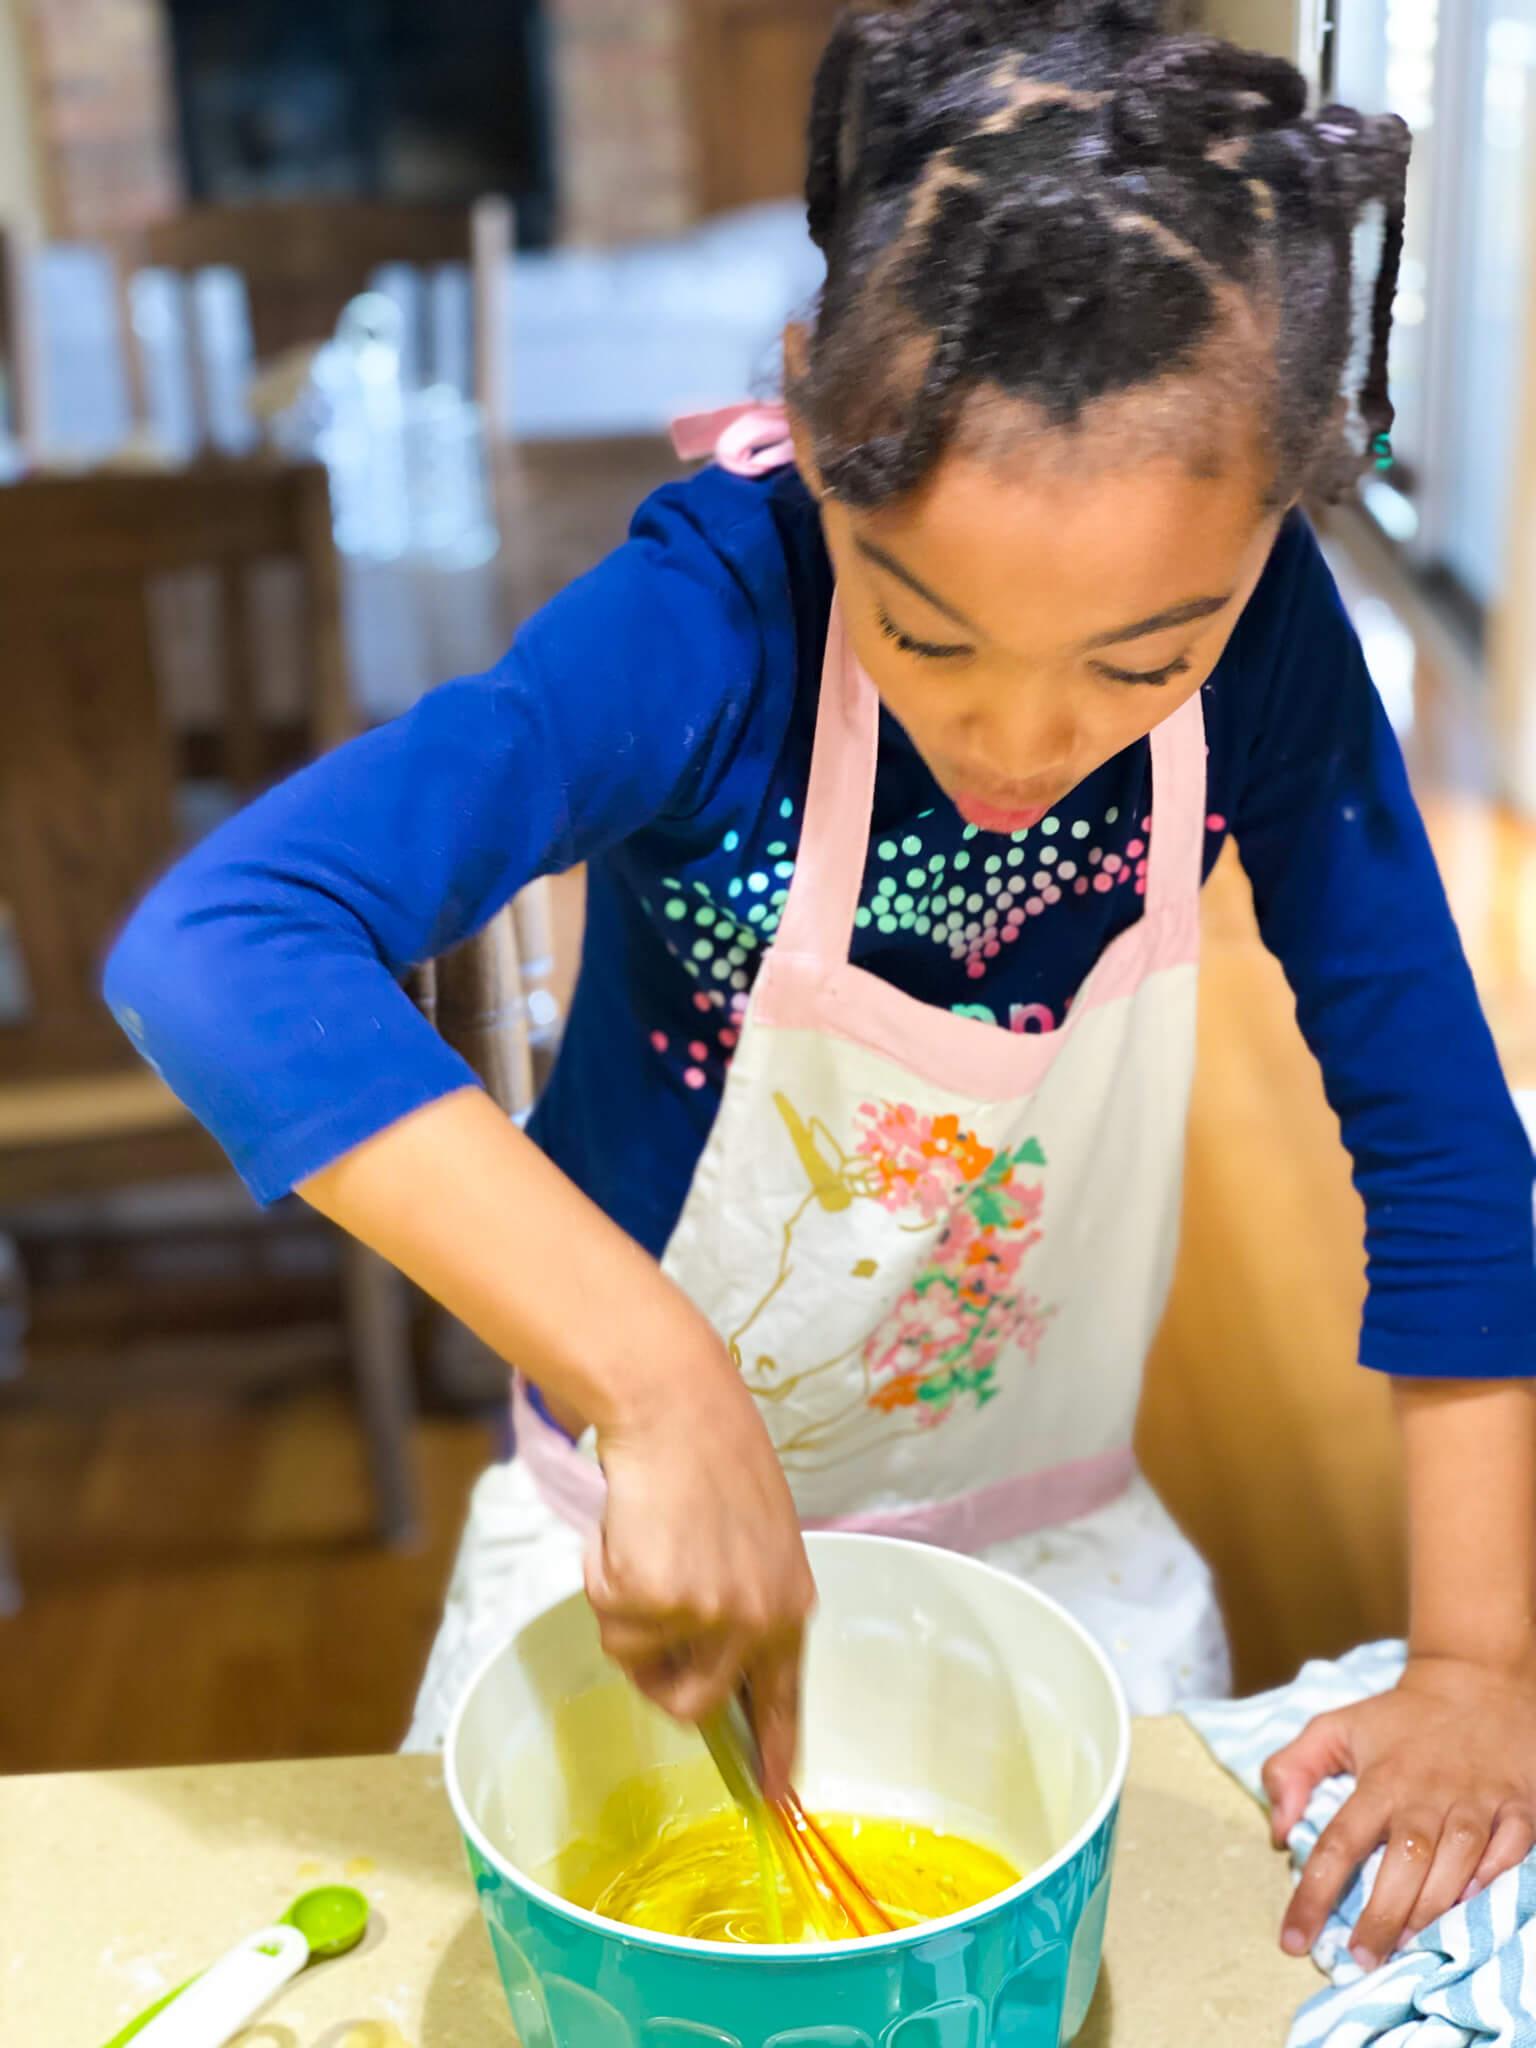 Gluten and Dairy-Free Almond Poppy Seed Sheet Cake Recipe agutsygirl.com #glutenfreerecipe #dairyfreerecipe #glutenfreedairyfree #poppyseed Samarah mixing